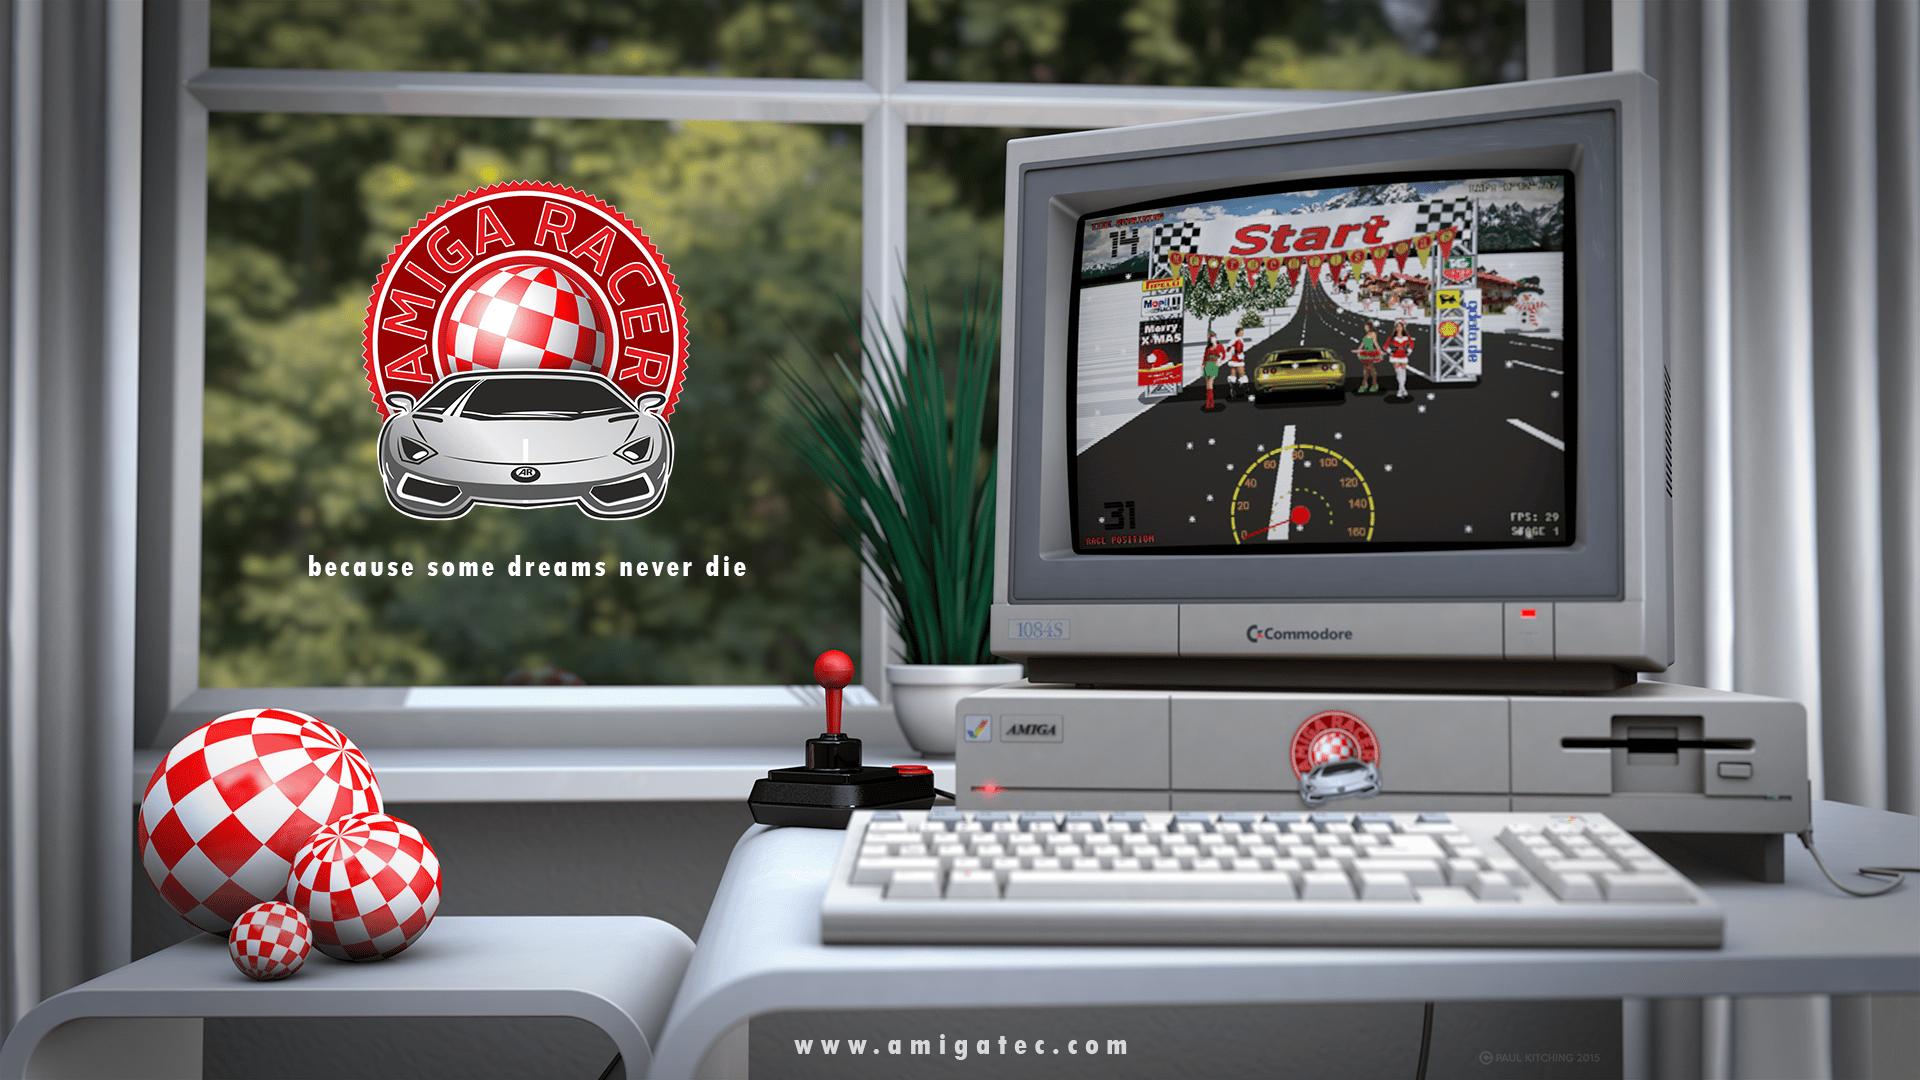 AmigaTec - Amiga Racer - 1080p